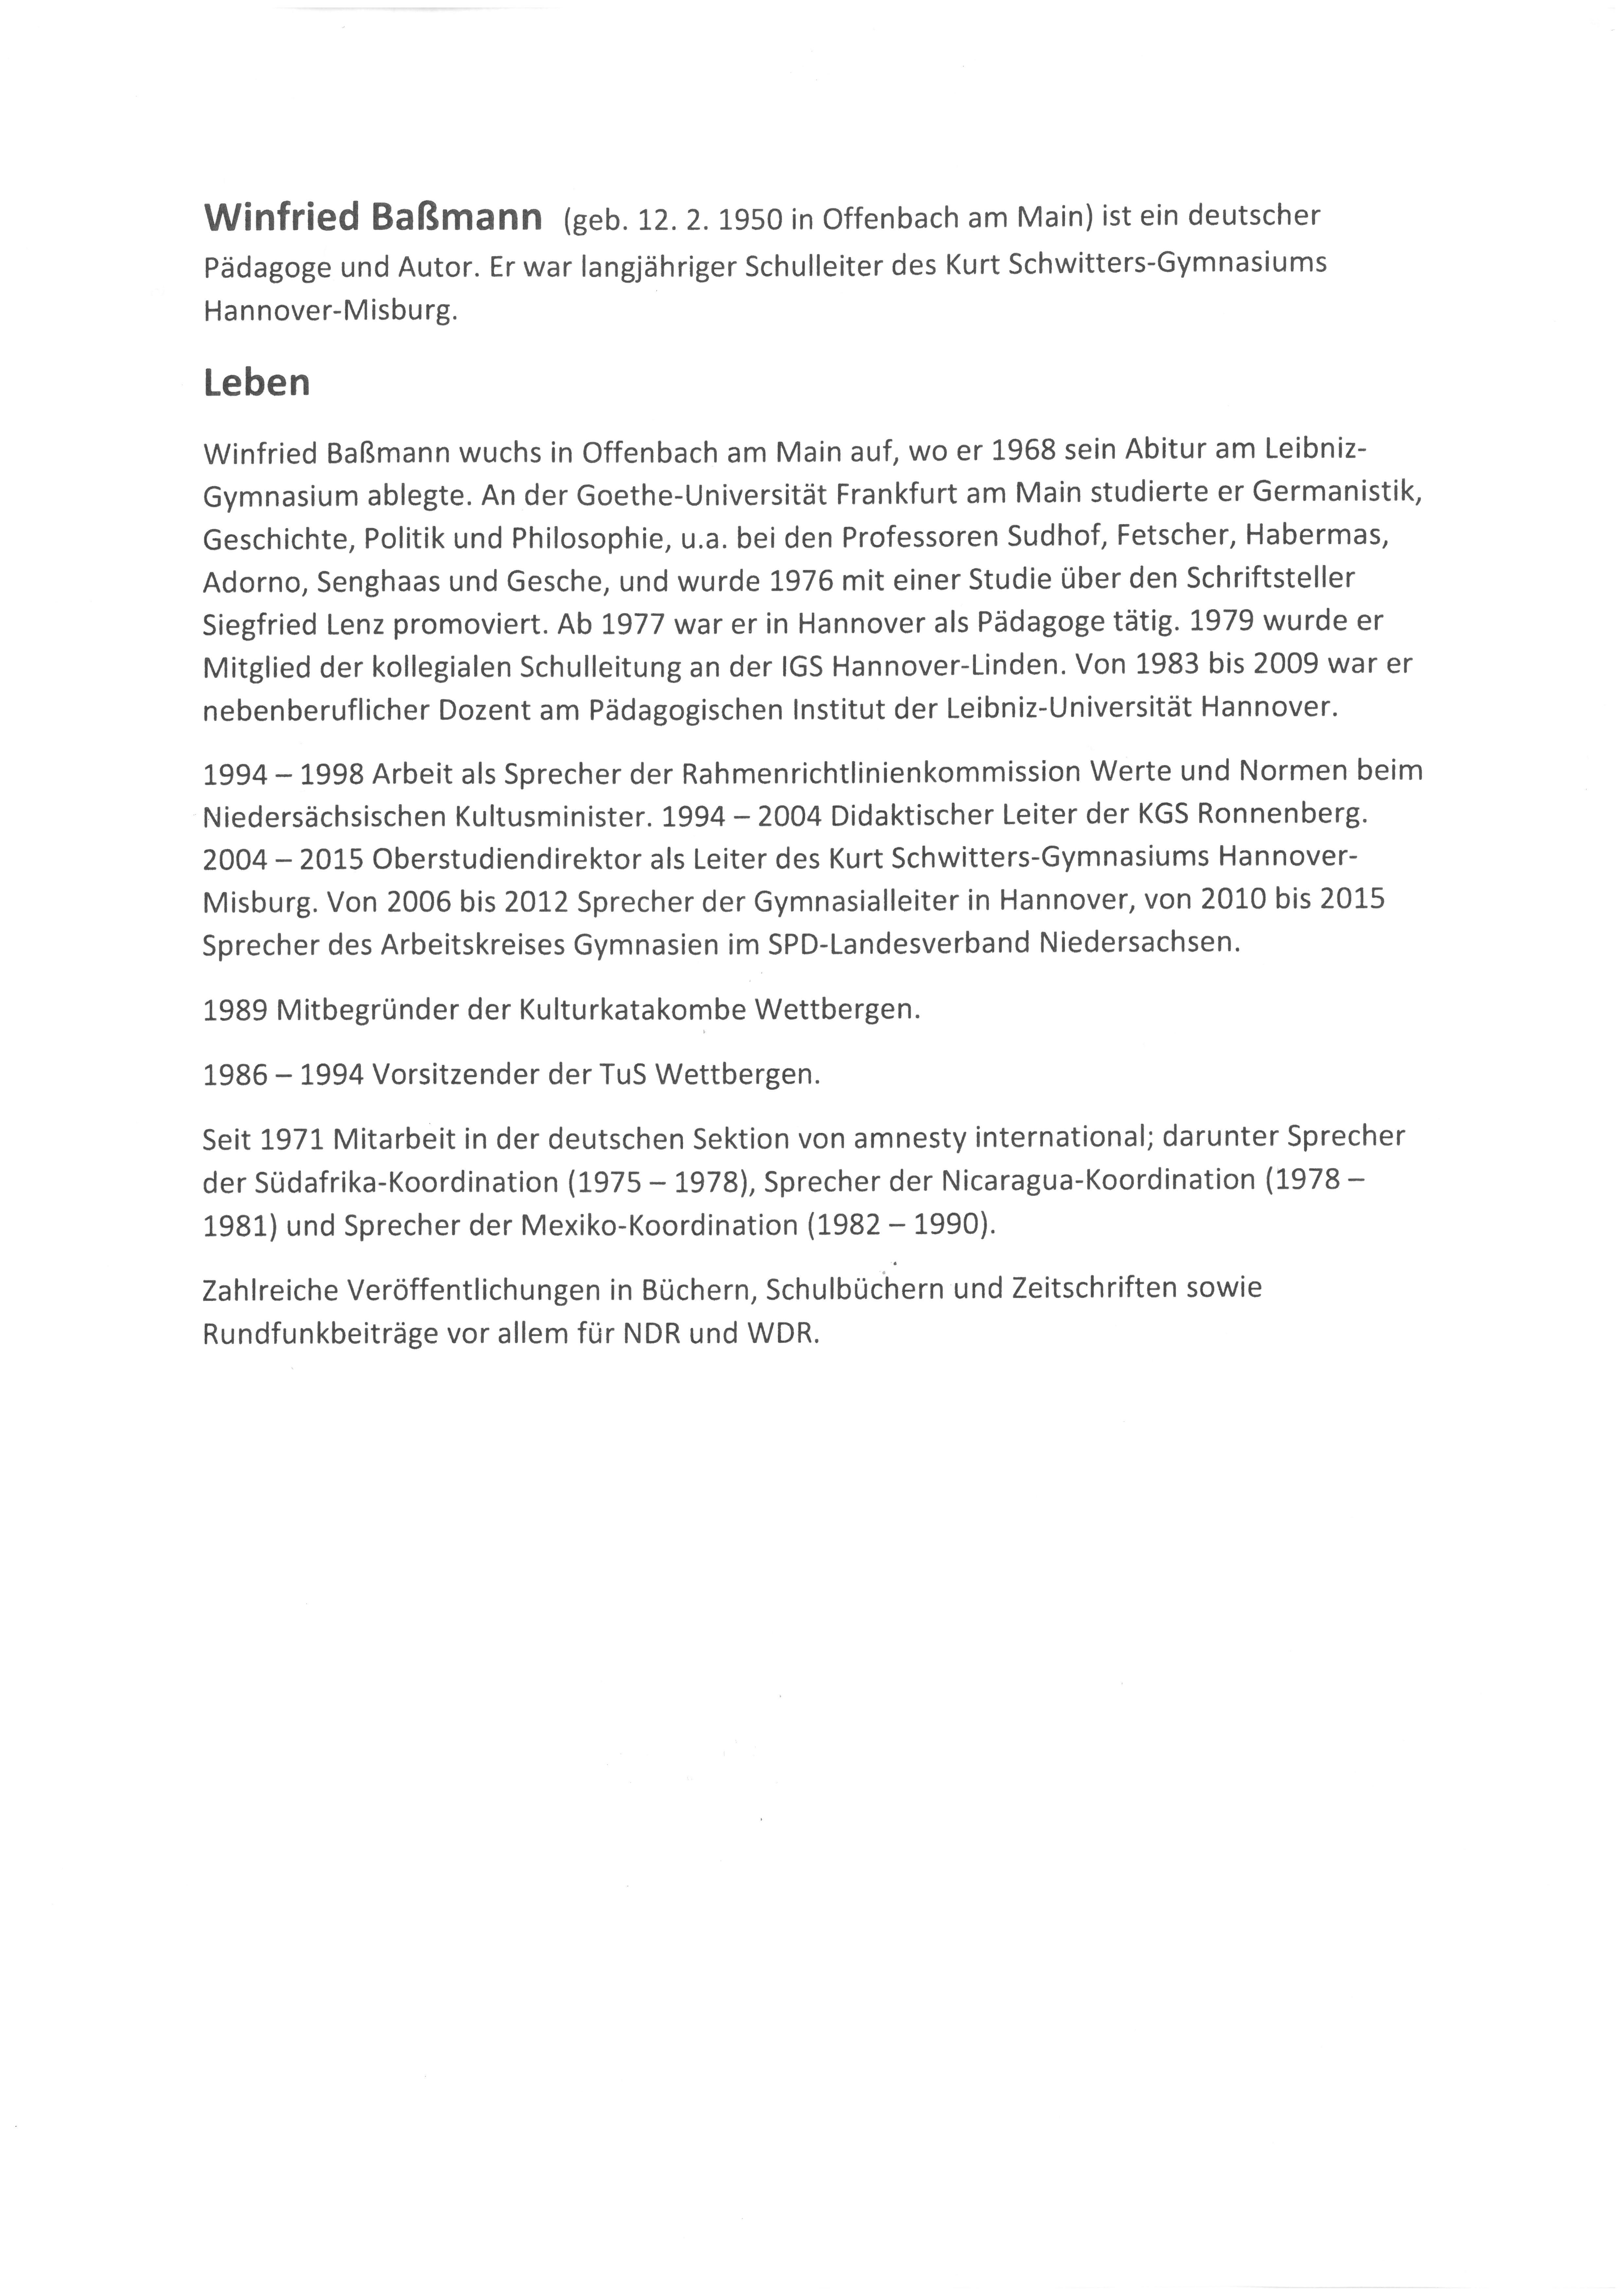 file2018 02 05 winfried bamann lebenslauf als publikationjpg - Lebenslauf Flietext